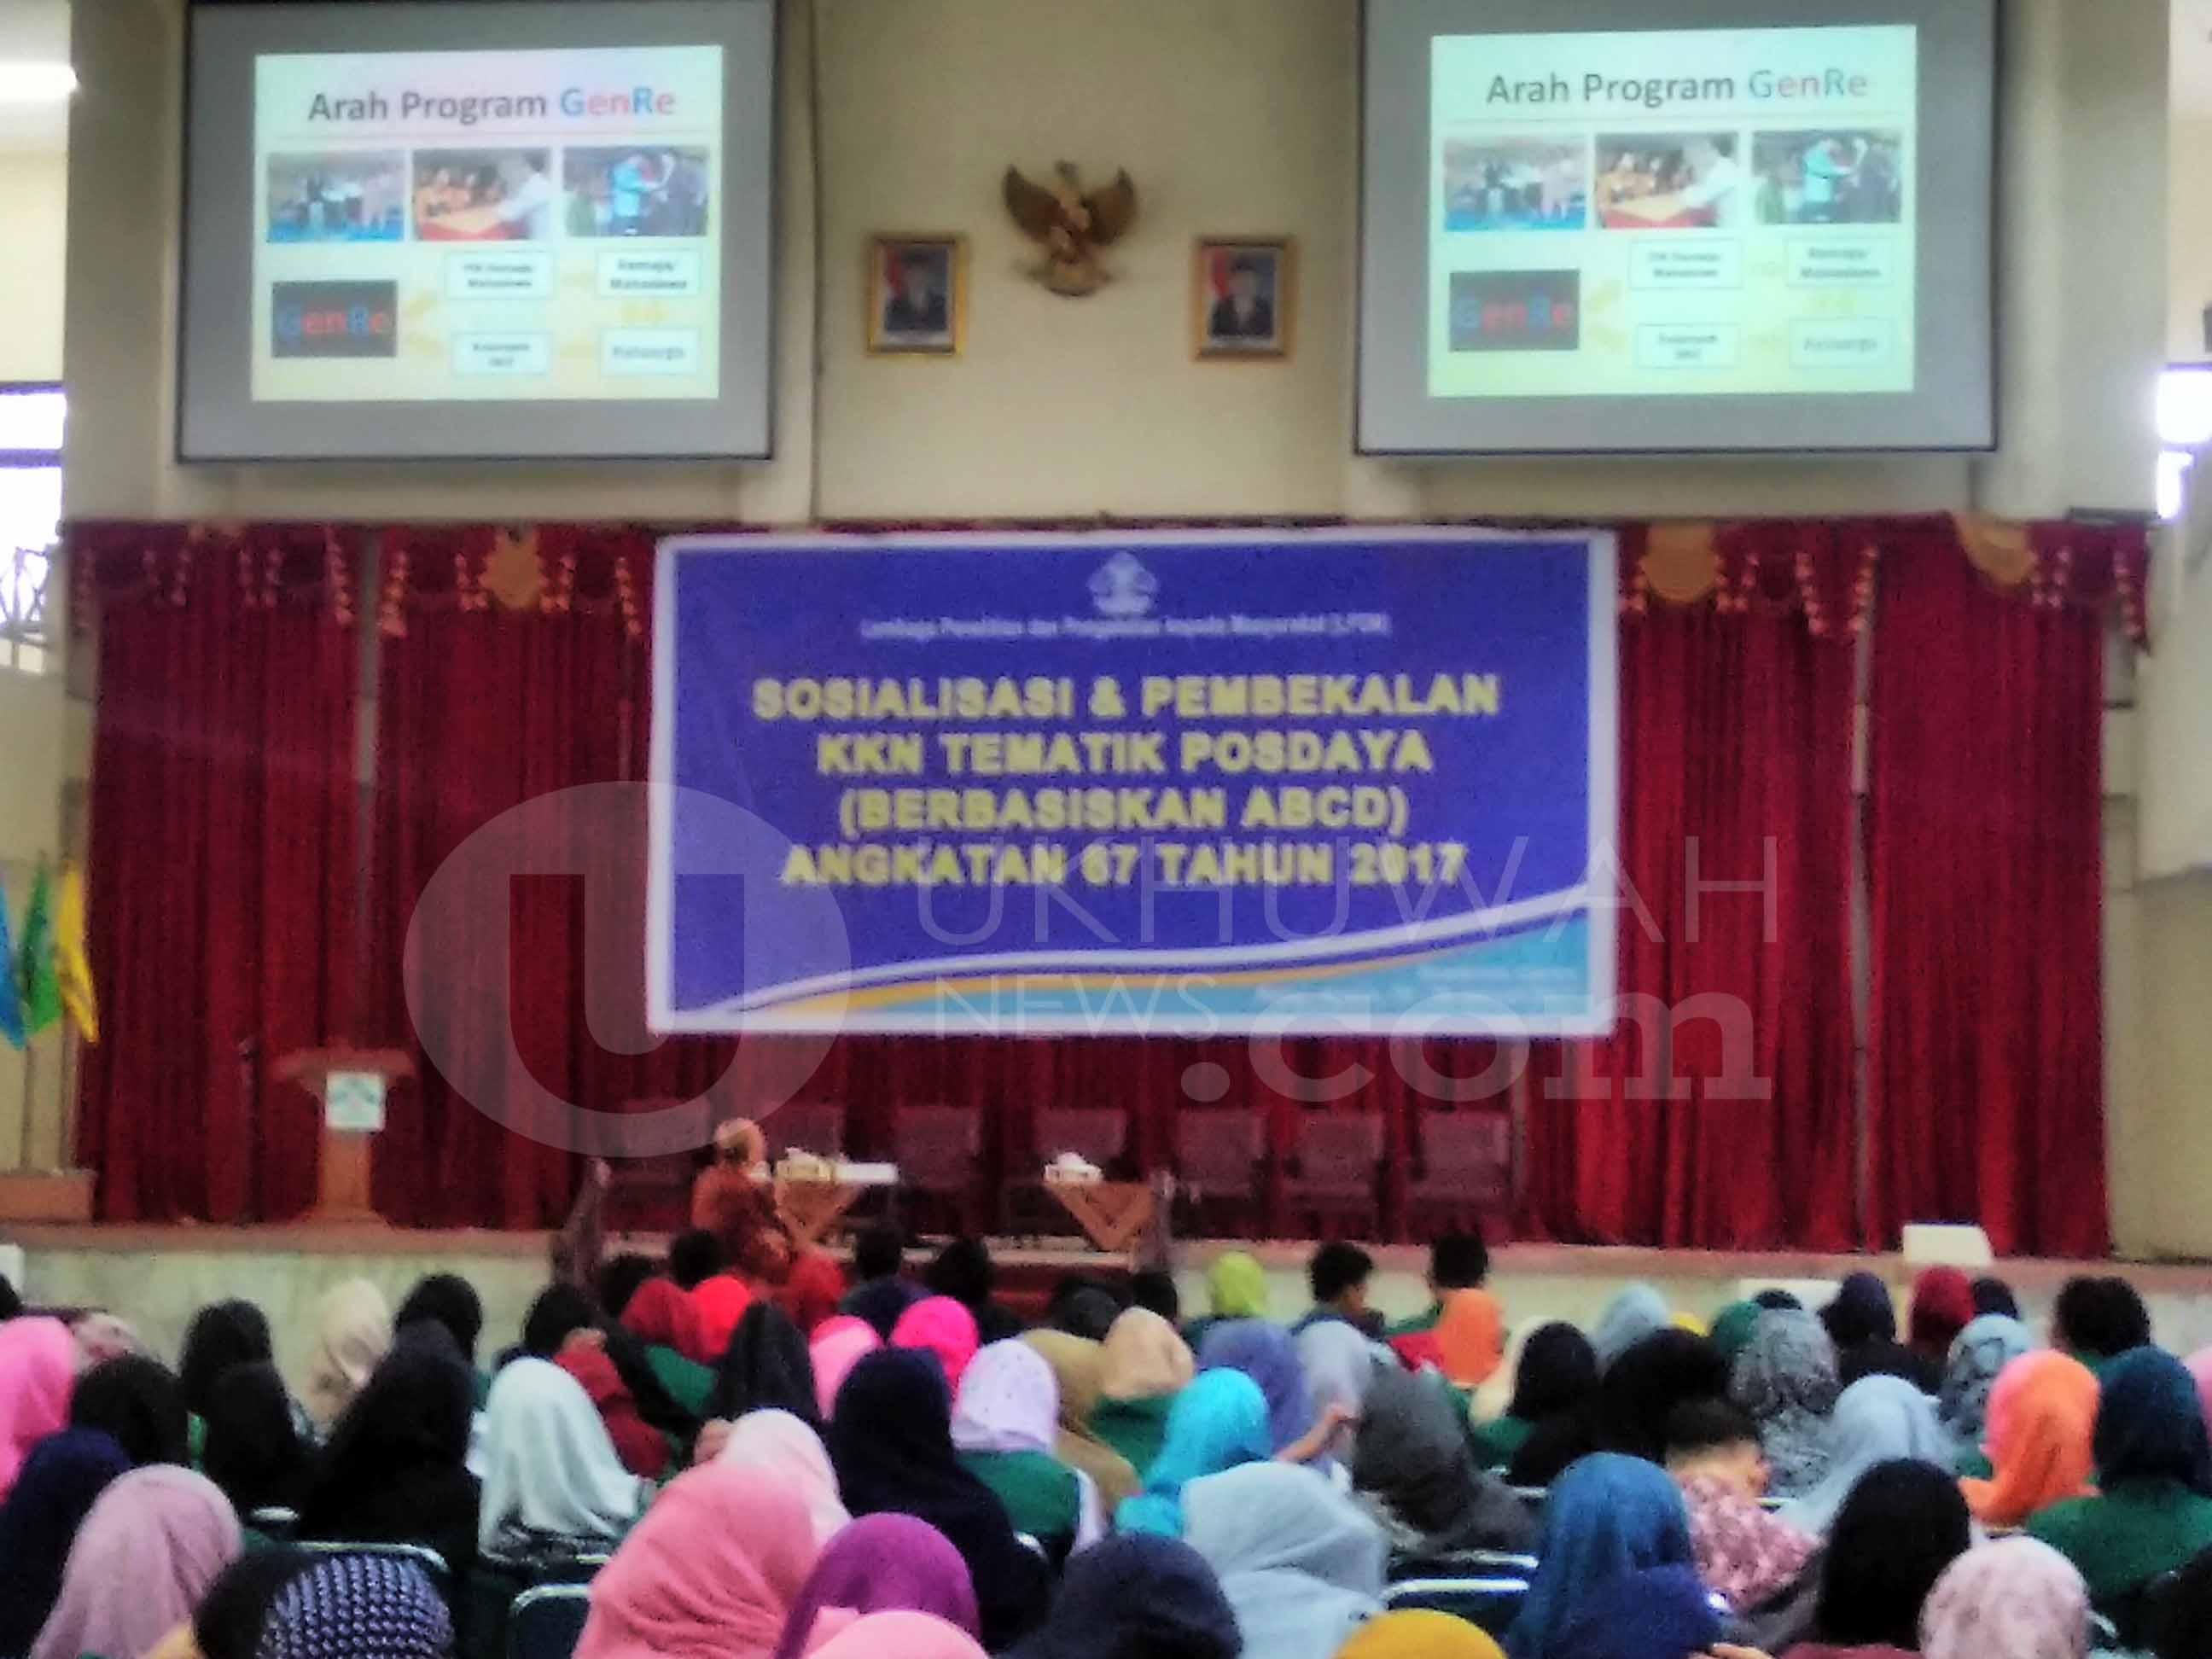 Sosialisasi dan pembekalan KKN tematik posdaya (berbasiskan abcd) angkatan ke 67 tahun 2017 yang diselenggarakan oleh Lembaga Penelitian dan  Pengabdian kepada Masyarakat (LP2M), di gedung Academic Center Universitas Islam Negeri Raden Fatah (UIN RF) Palembang Rabu, 25/01/2017.